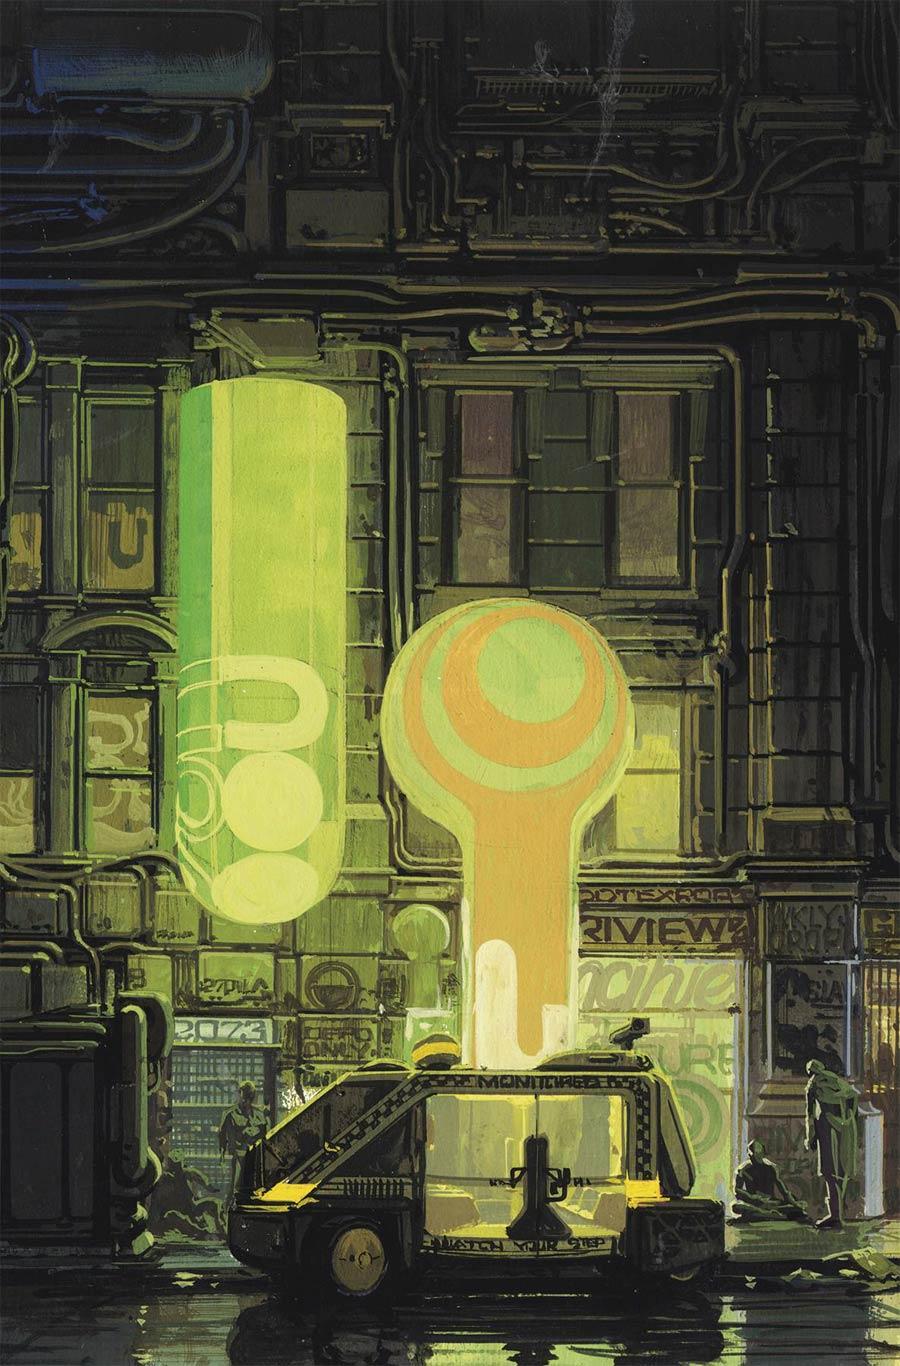 Blade Runner 2019 #5-8 Syd Mead Virgin Pack